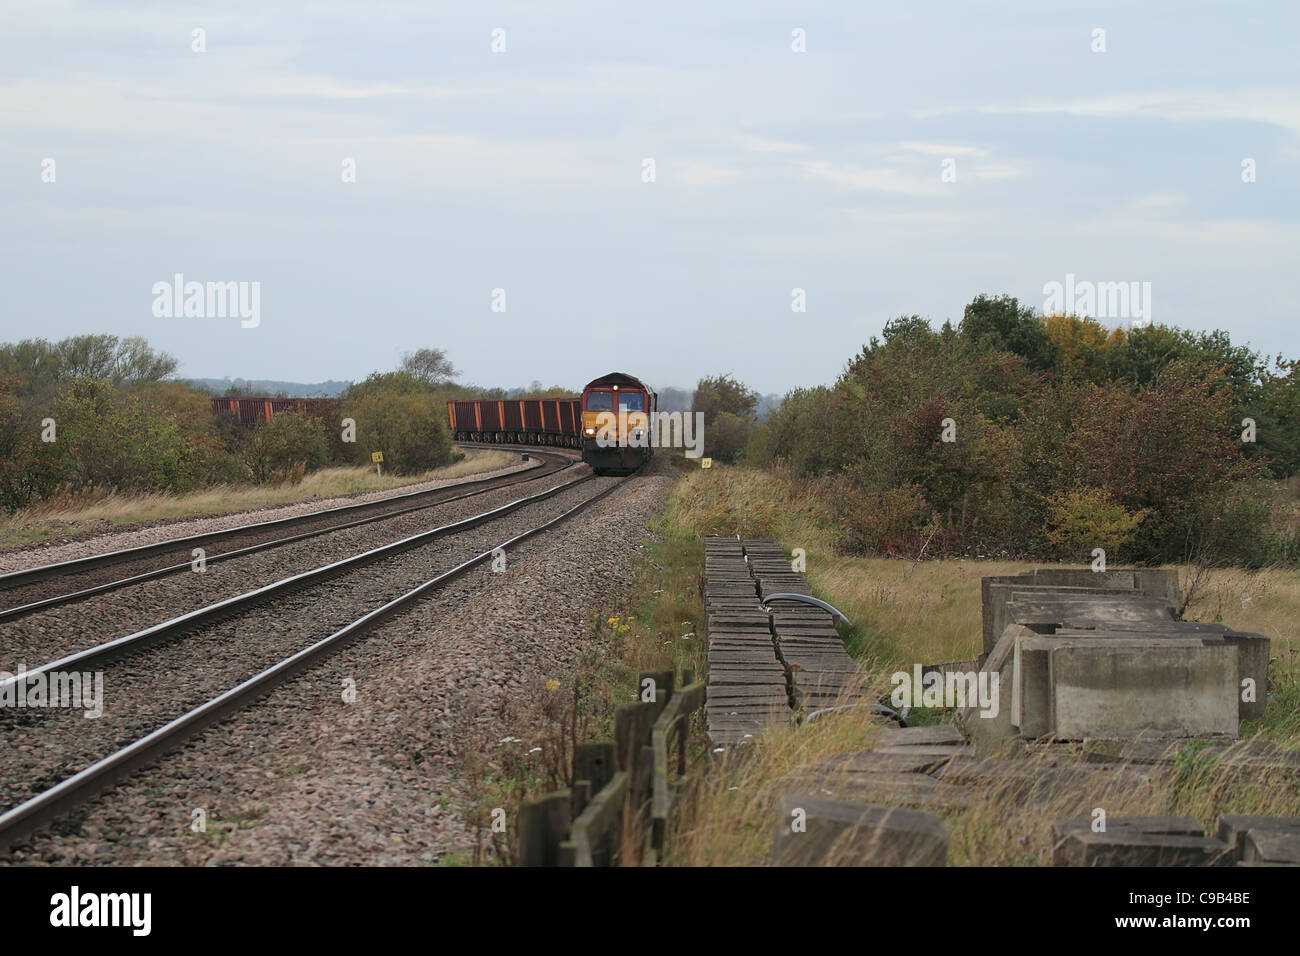 goods train freight train on railway tracks - Stock Image